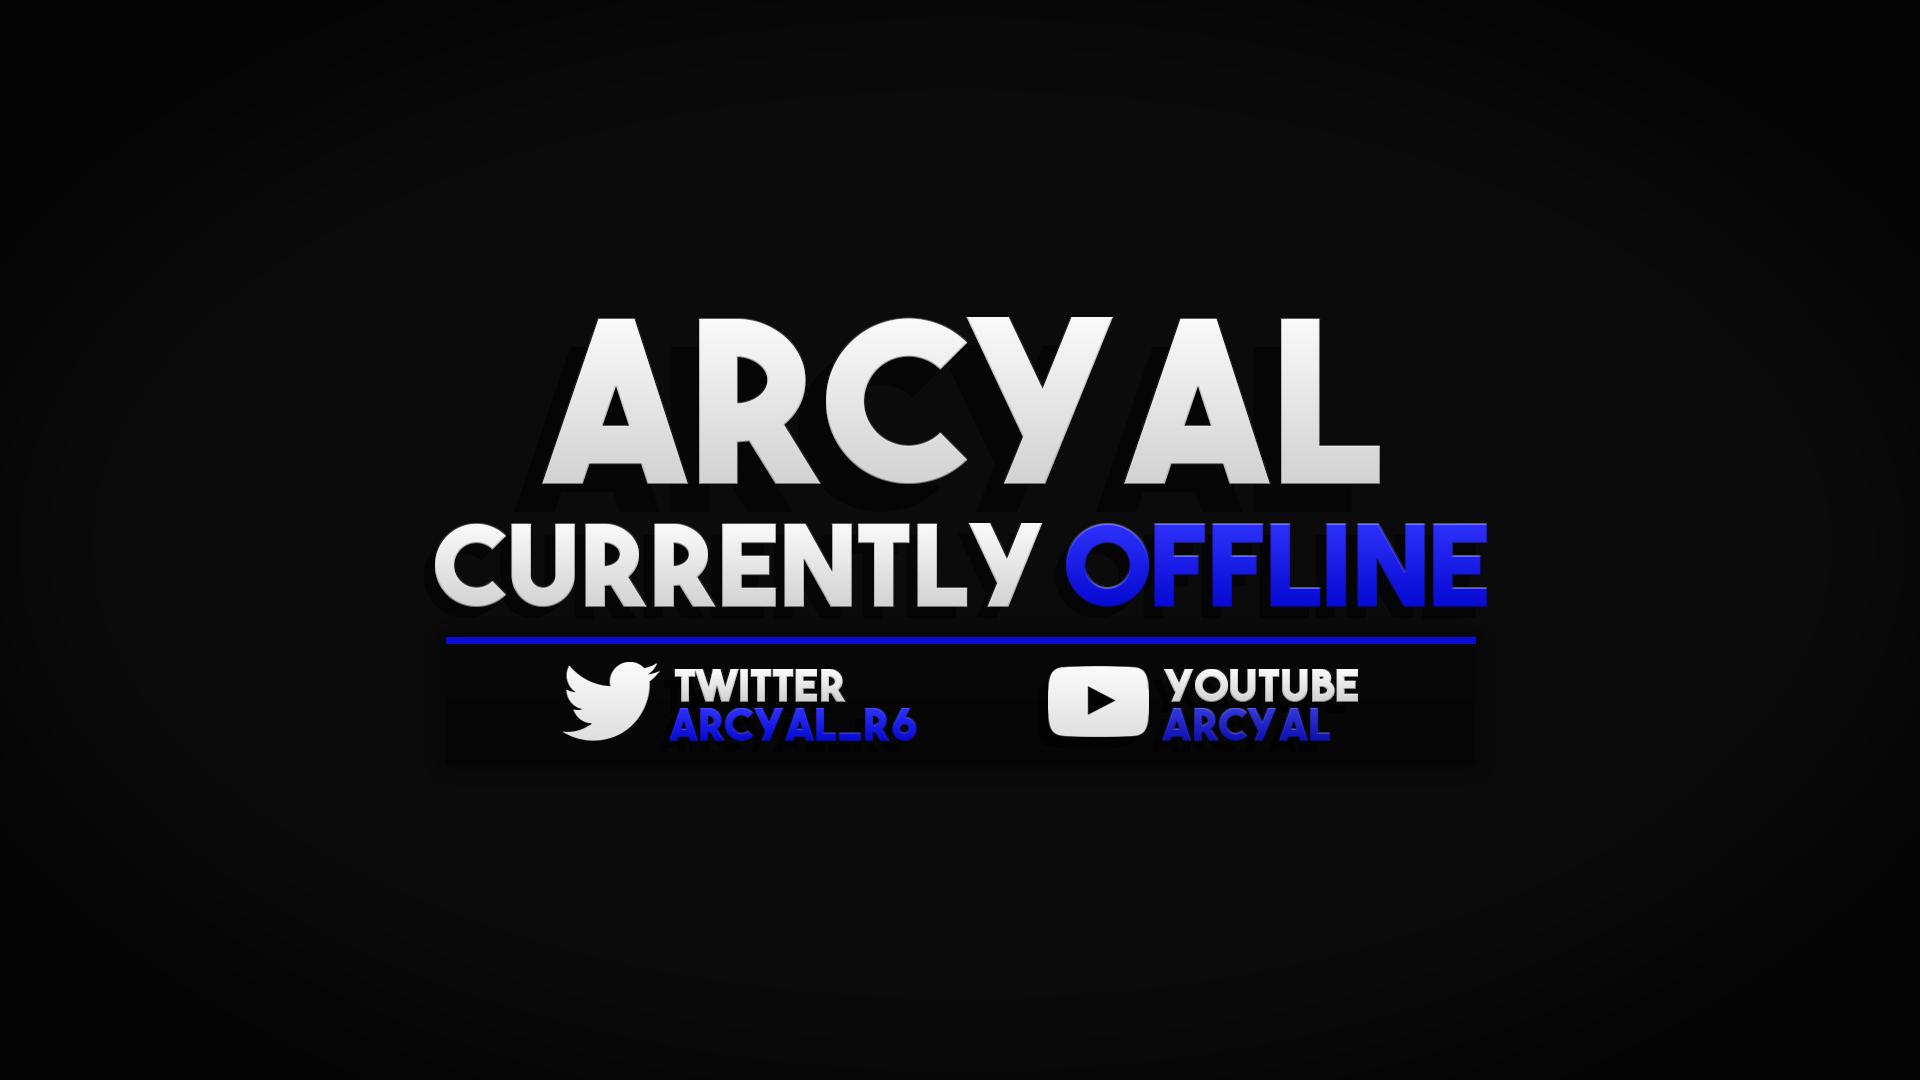 Arcyal Offline Screen.png